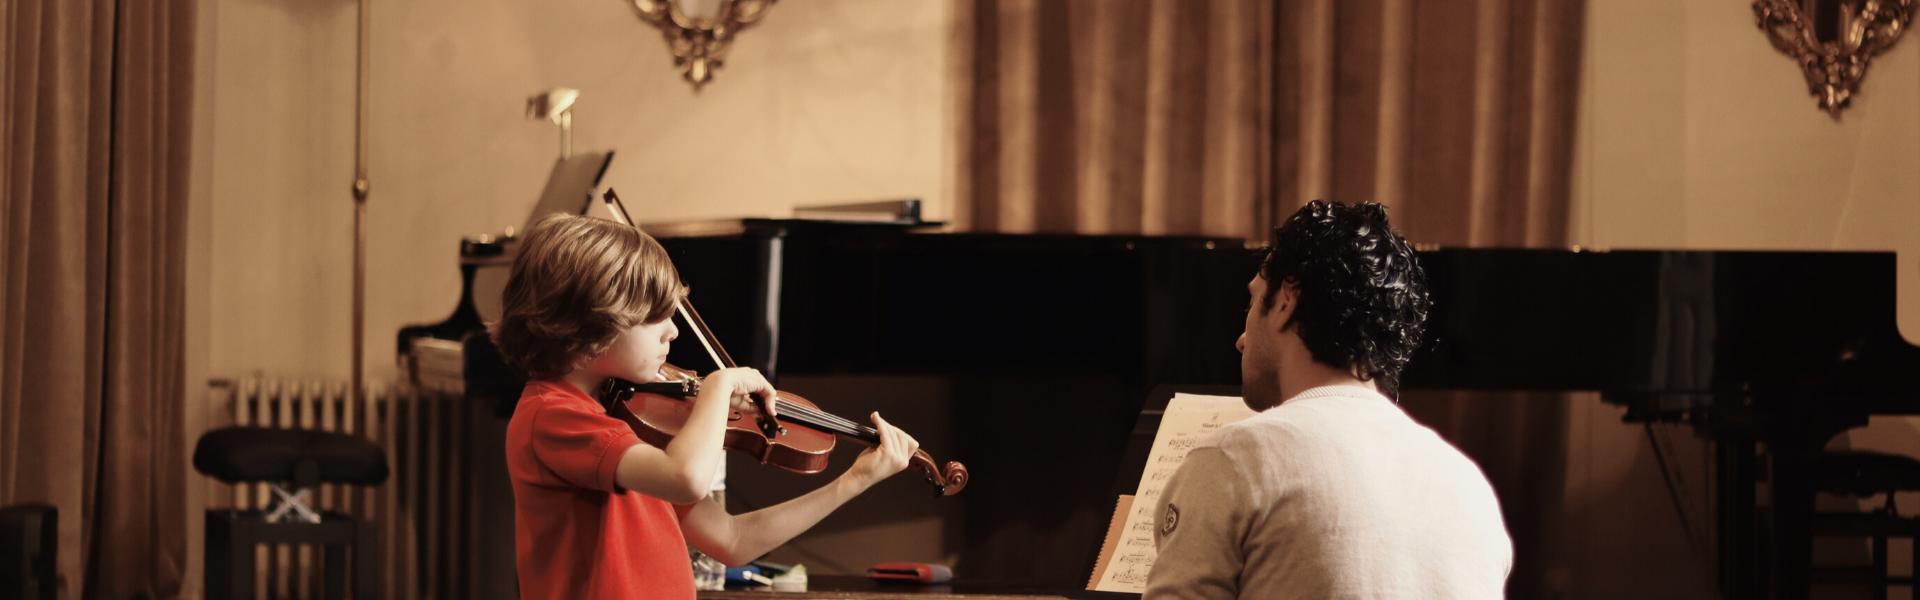 profesor violin